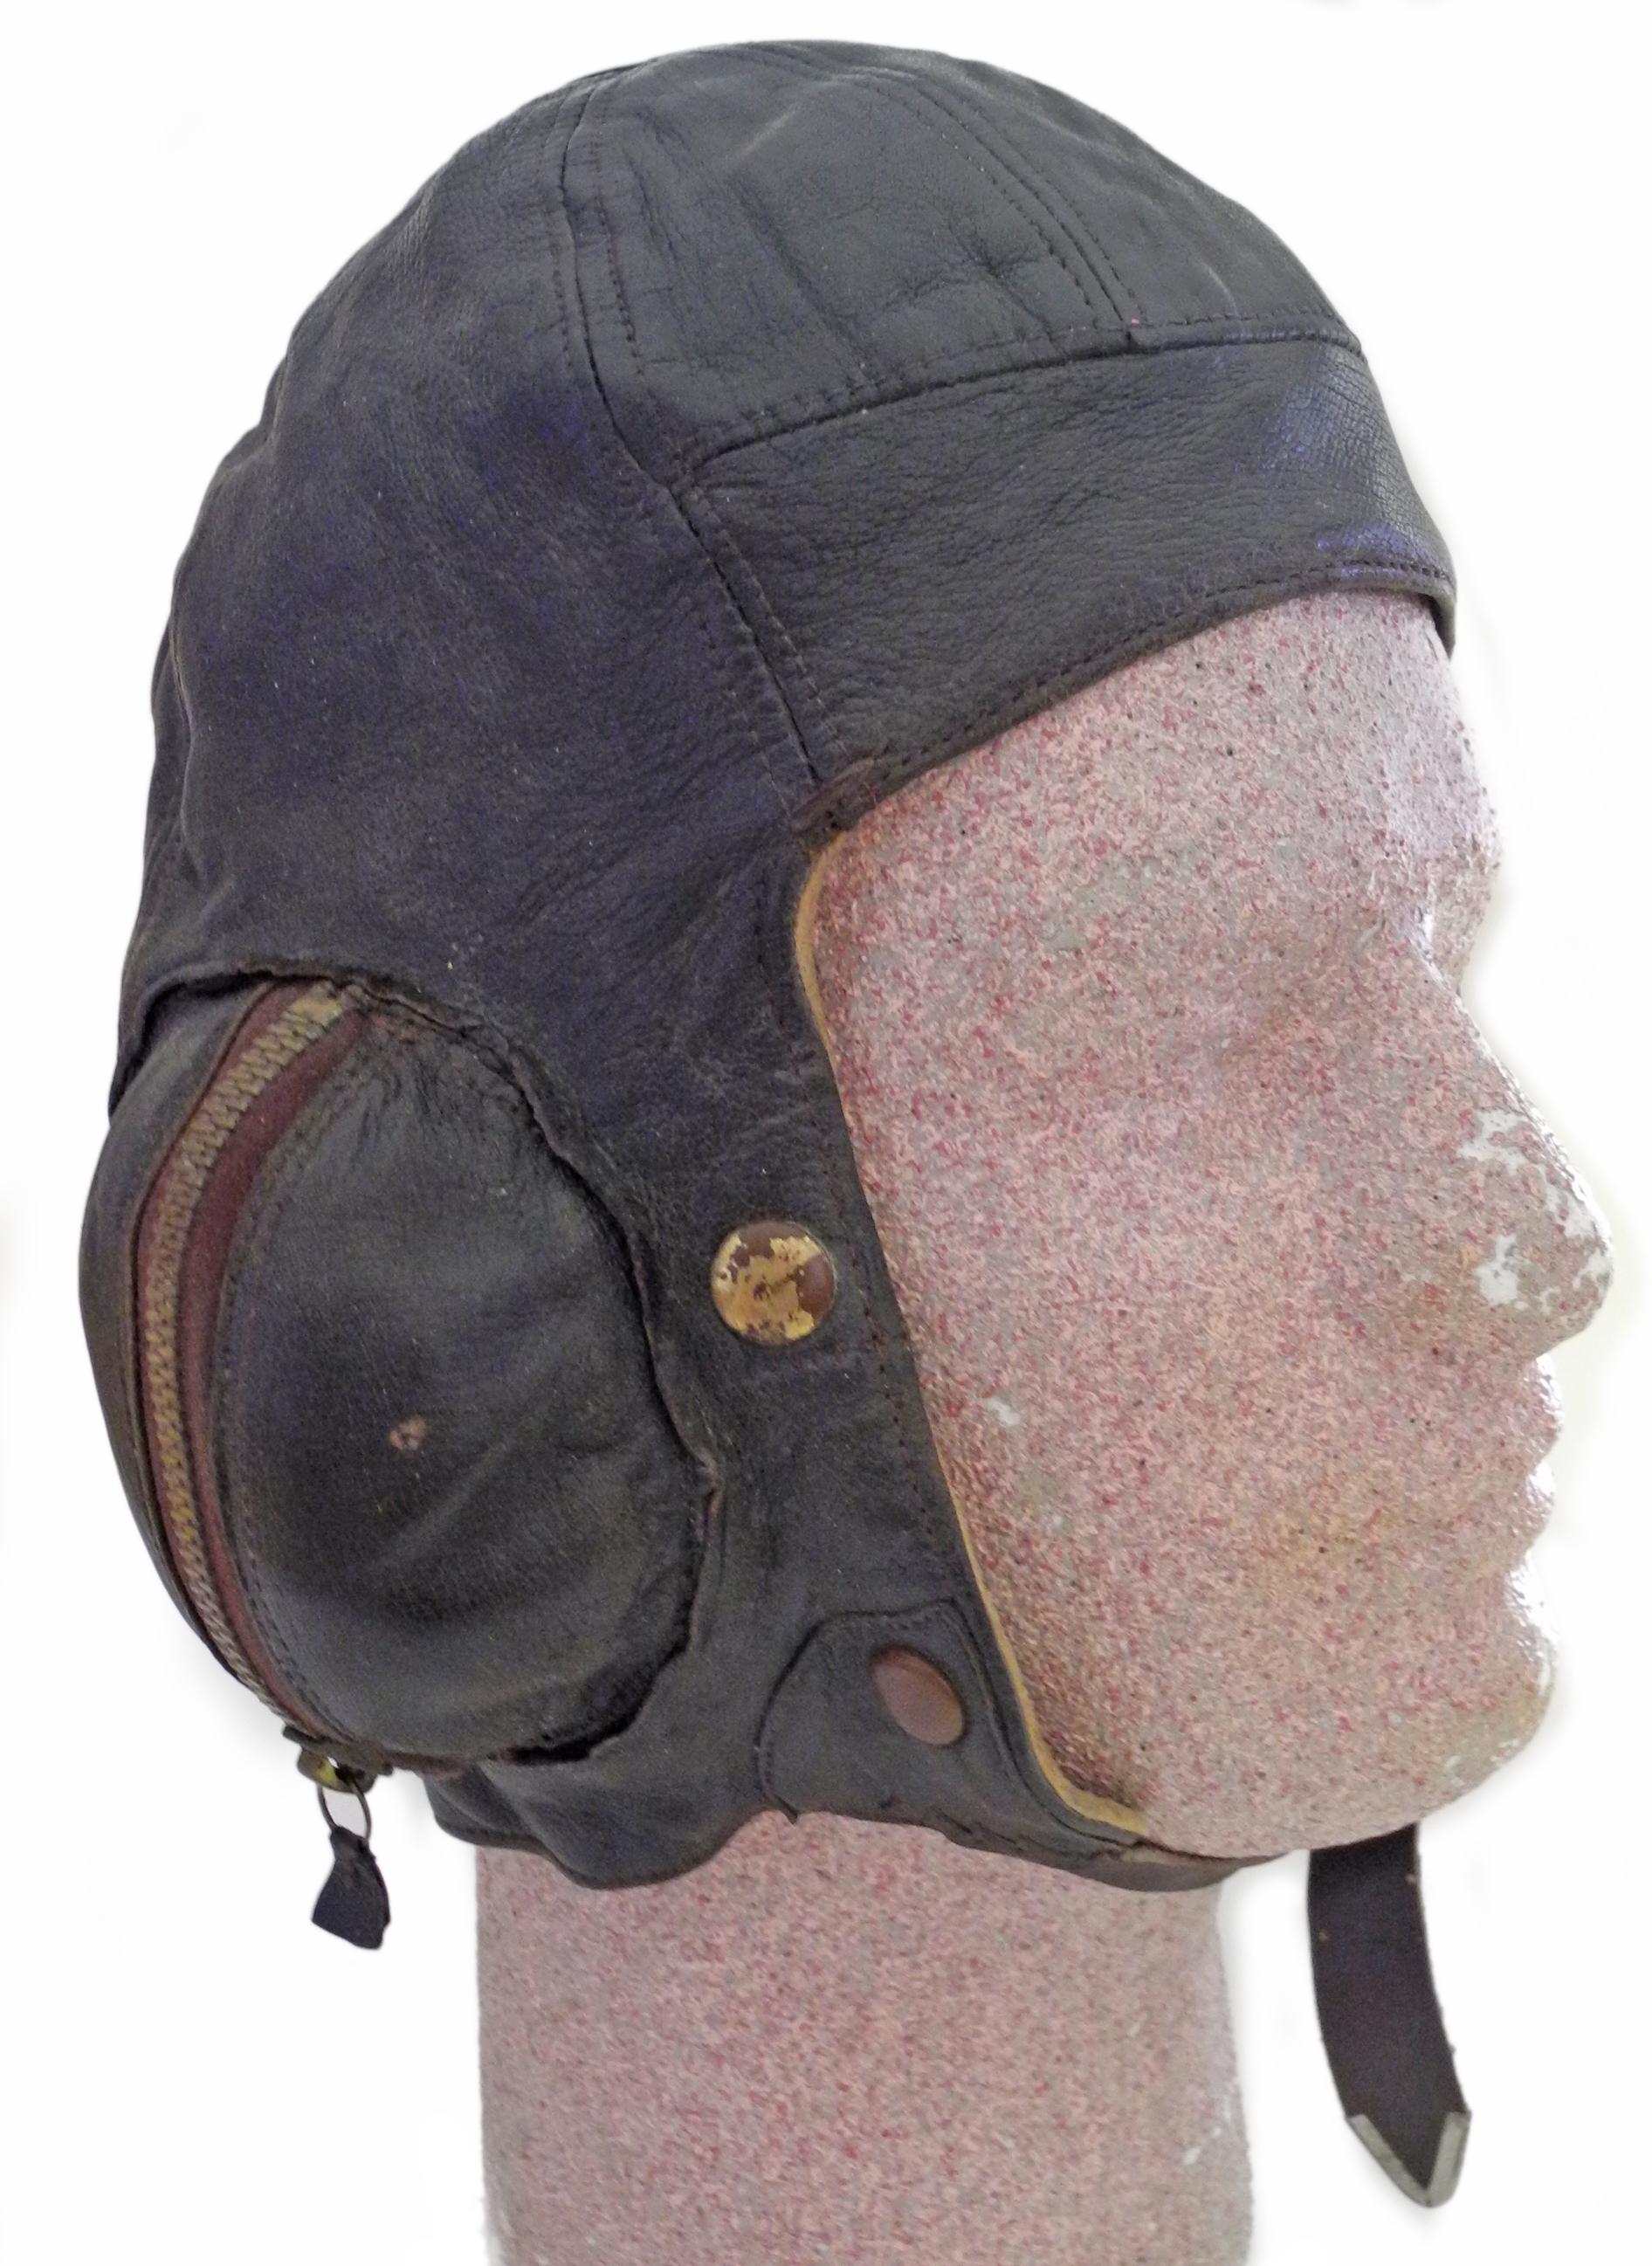 WWII RAF Type B helmet - $650